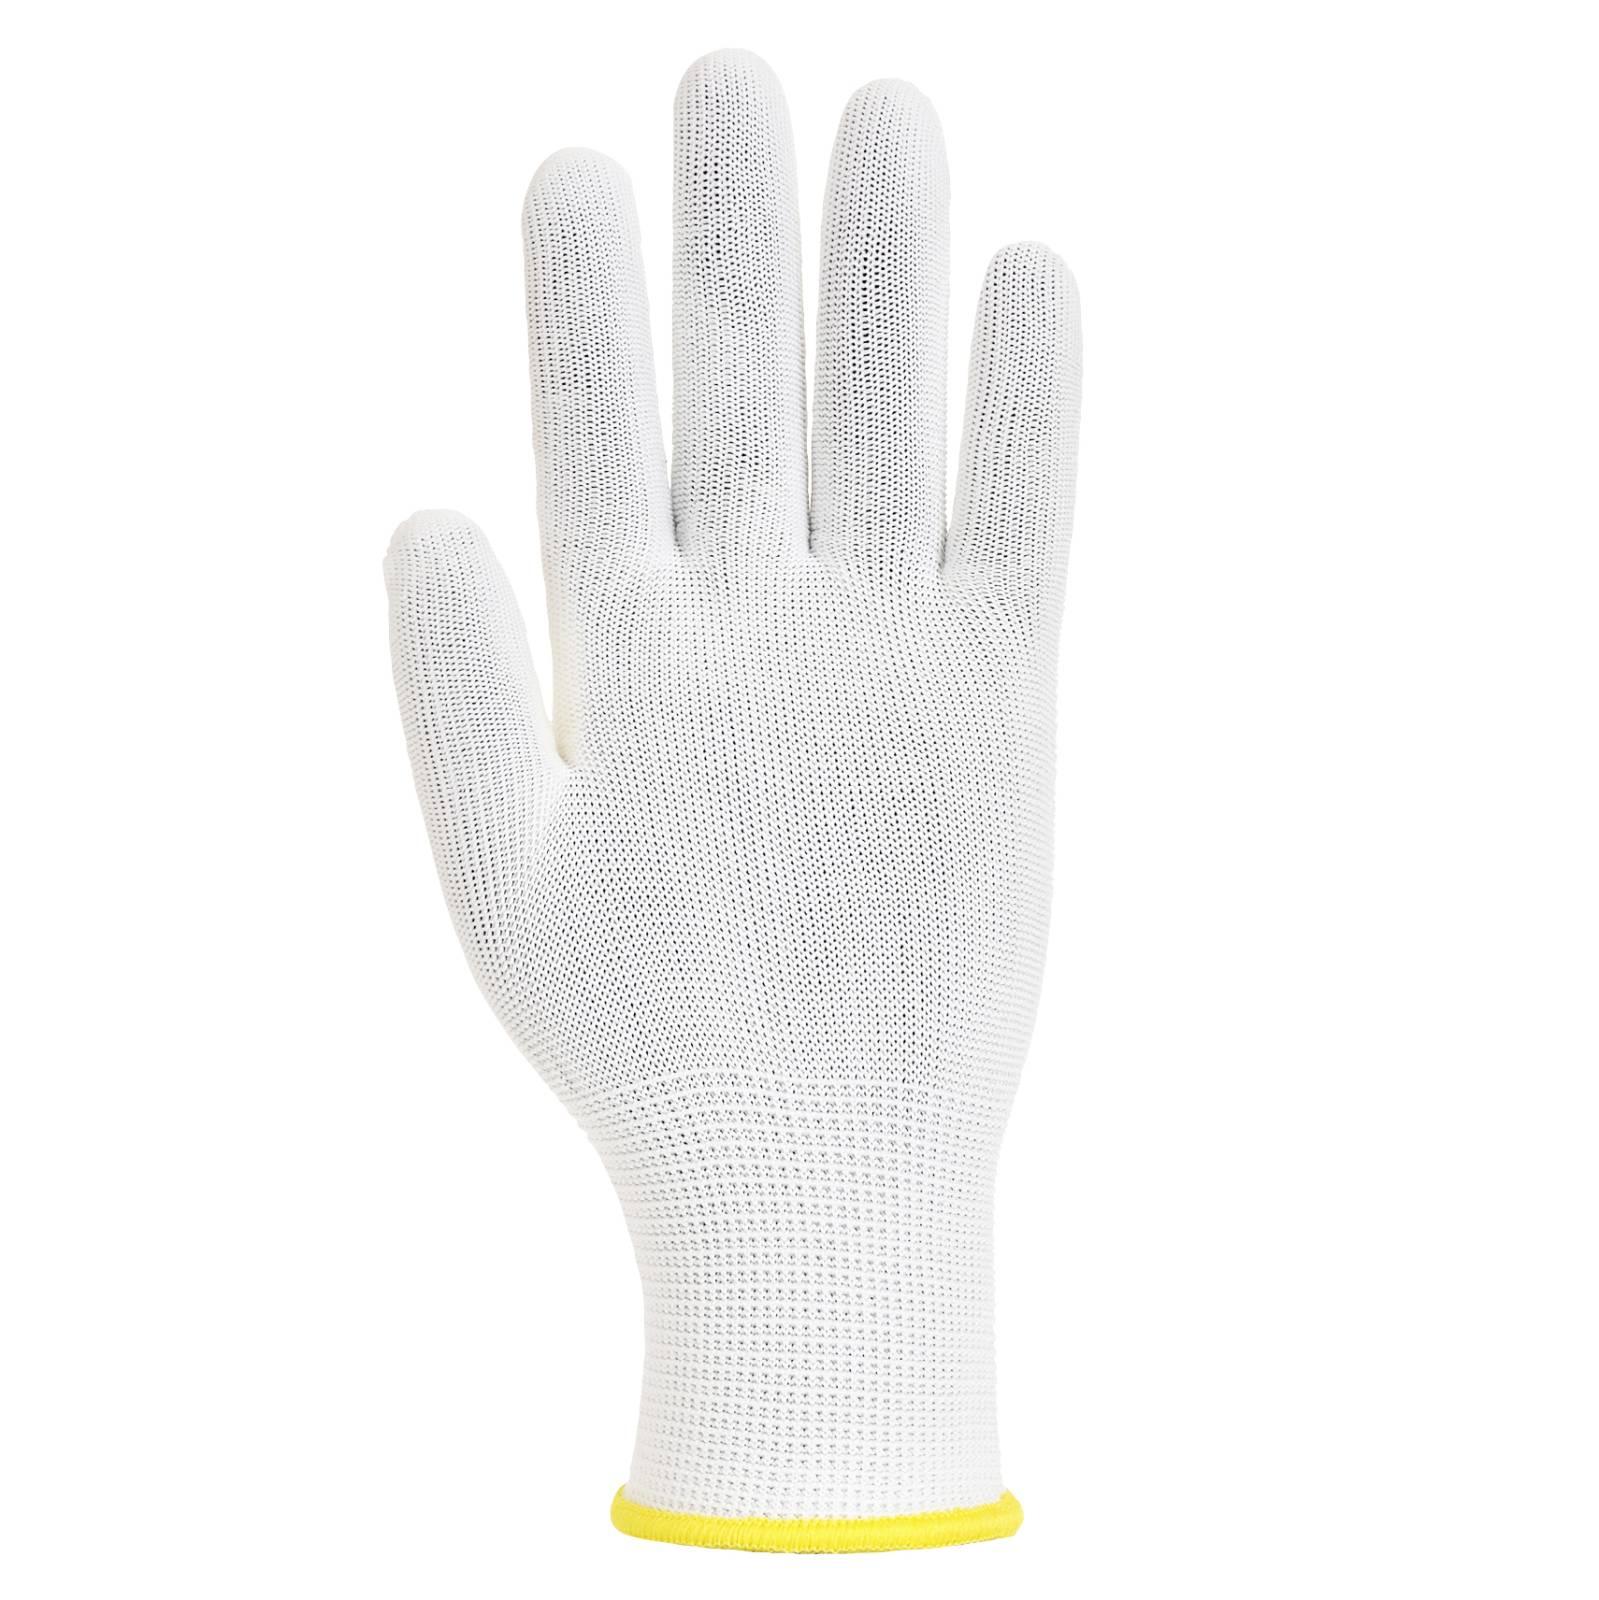 Portwest Handschoenen A020 wit(WH)